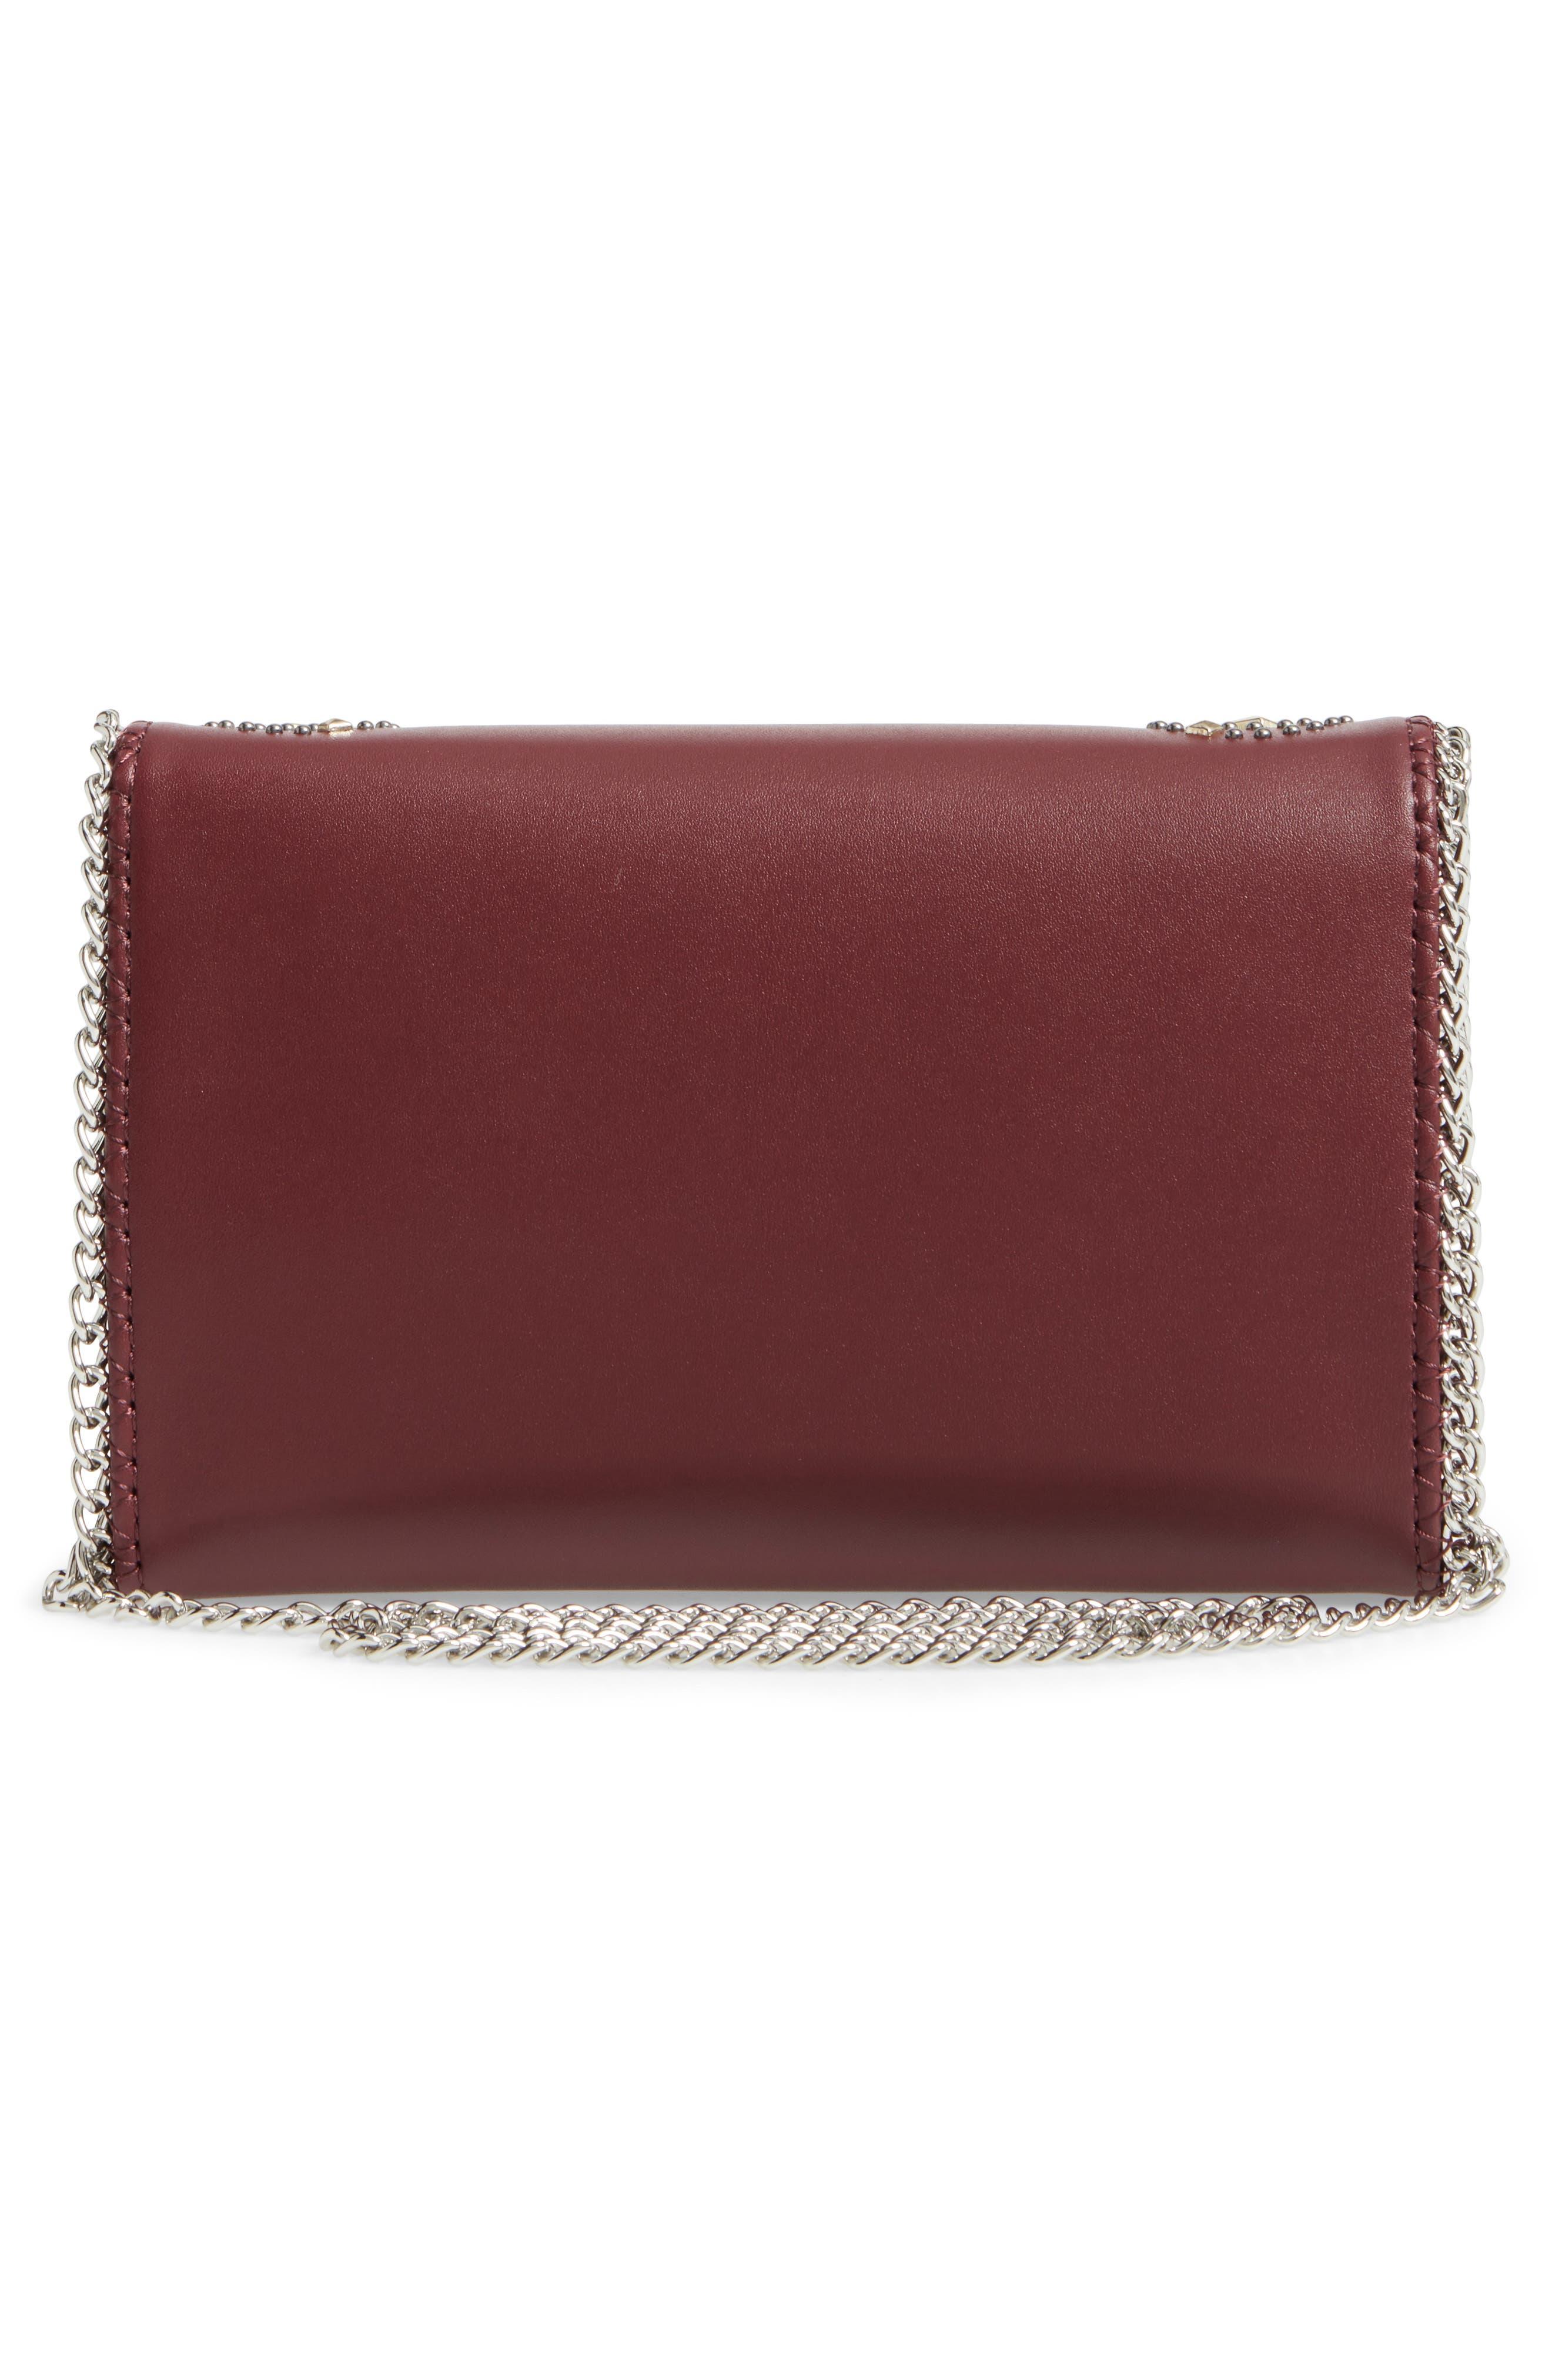 Alternate Image 3  - Chelsea28 Fleur Studded Faux Leather Convertible Clutch